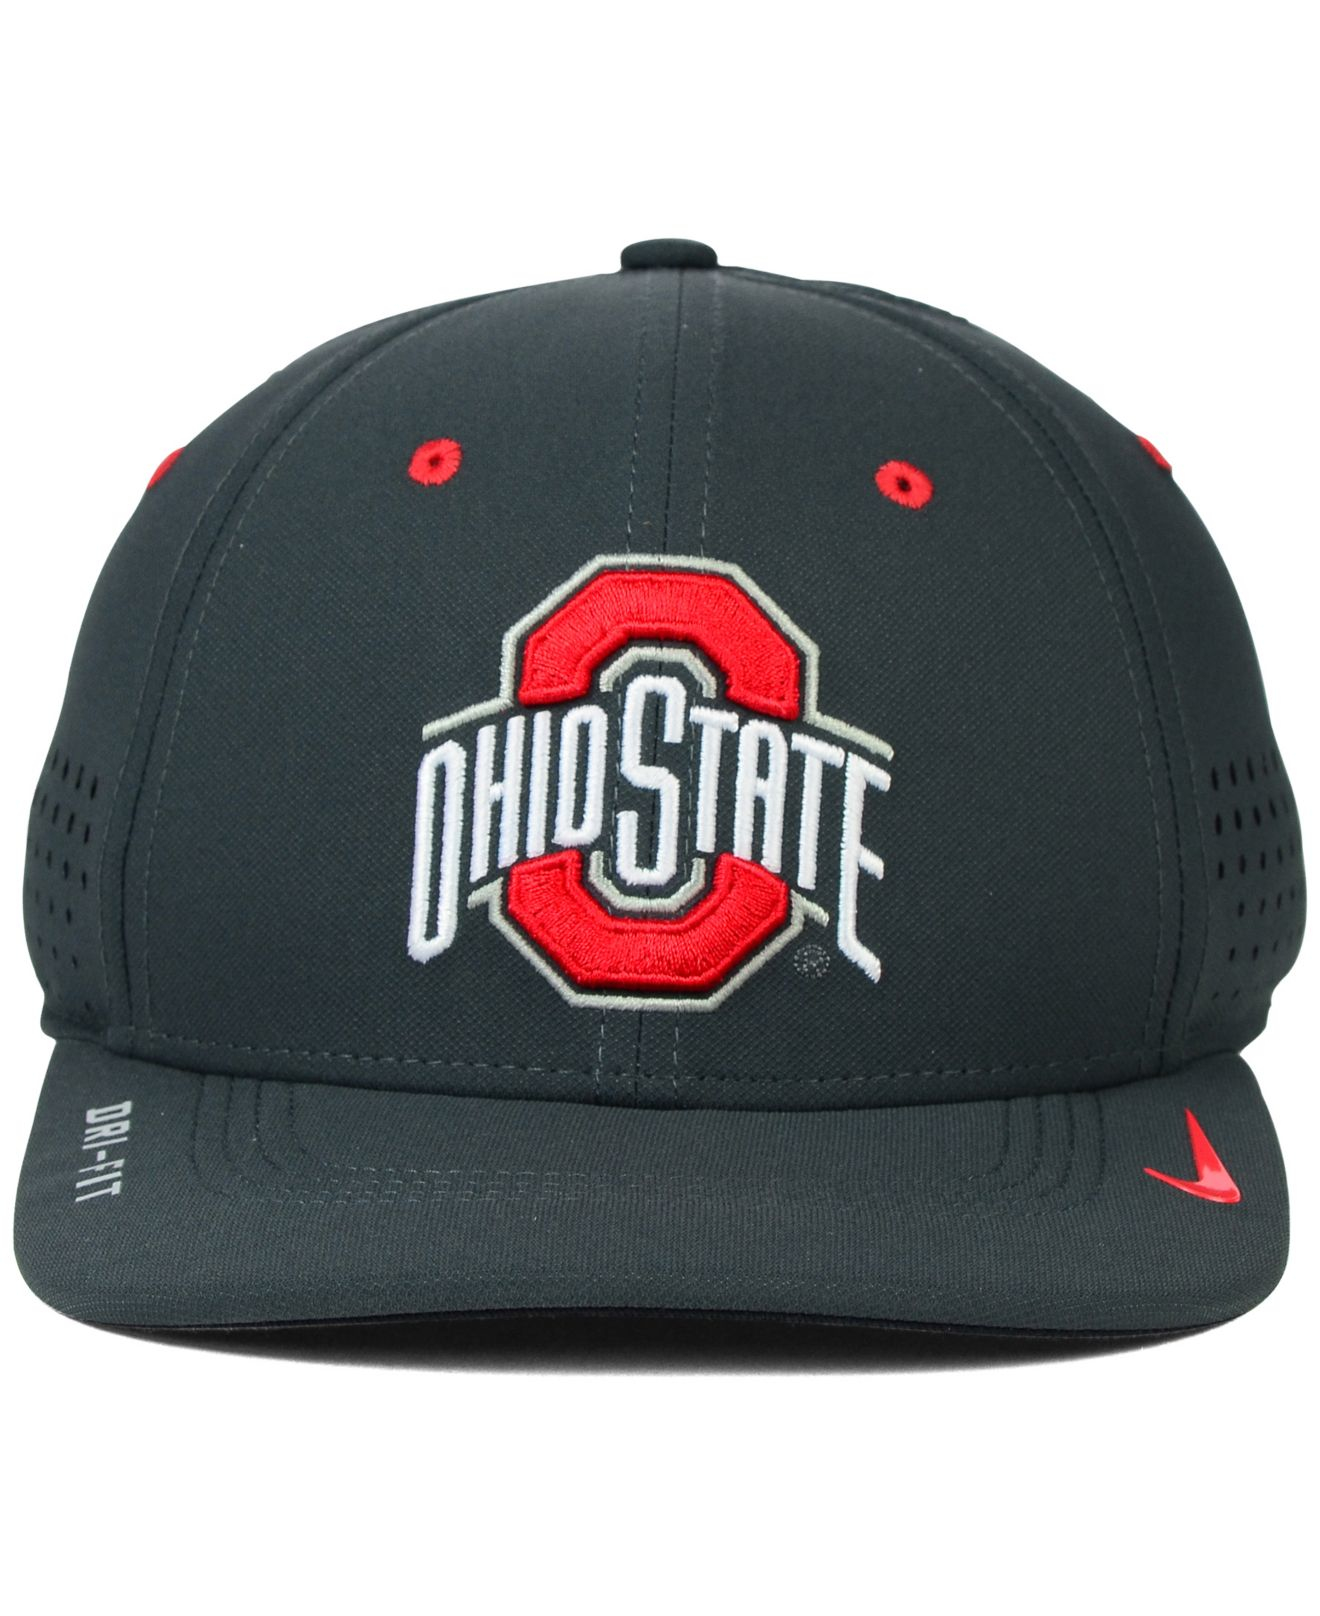 meet 42ee9 d3b0b ... switzerland lyst nike ohio state buckeyes sideline cap in gray for men  7c81c 8343b